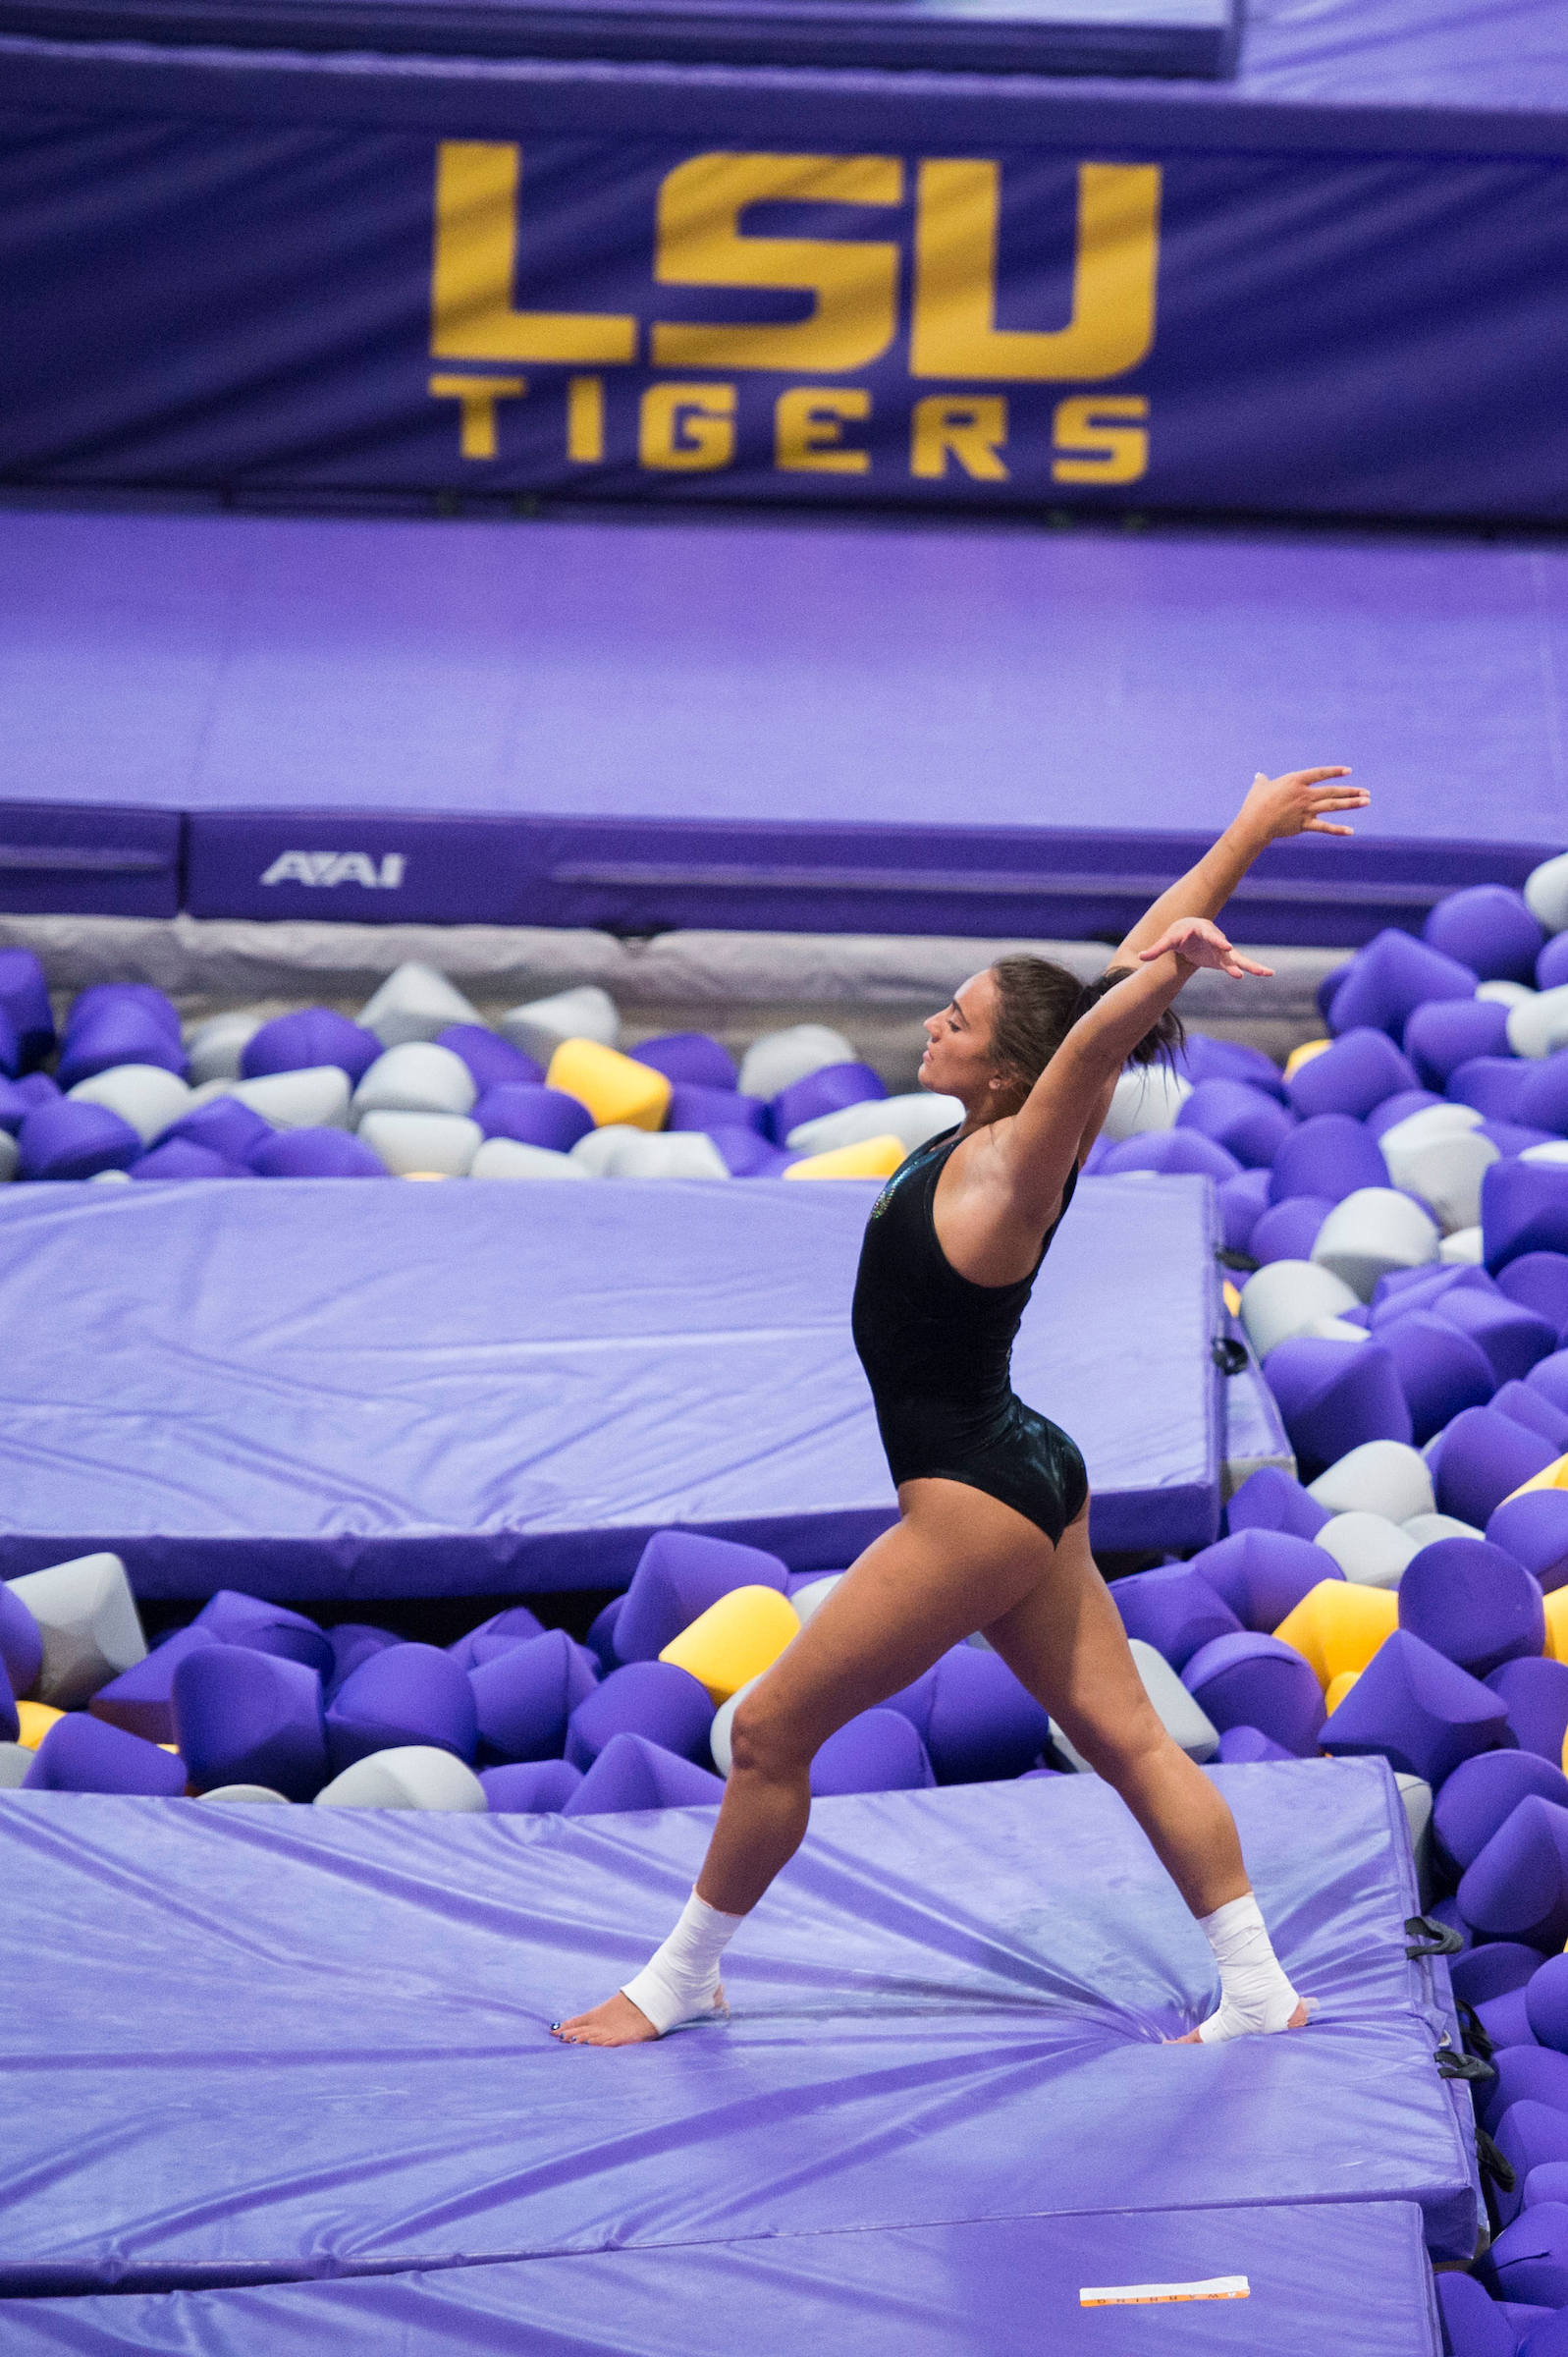 GymnasticsPractice0468.jpg